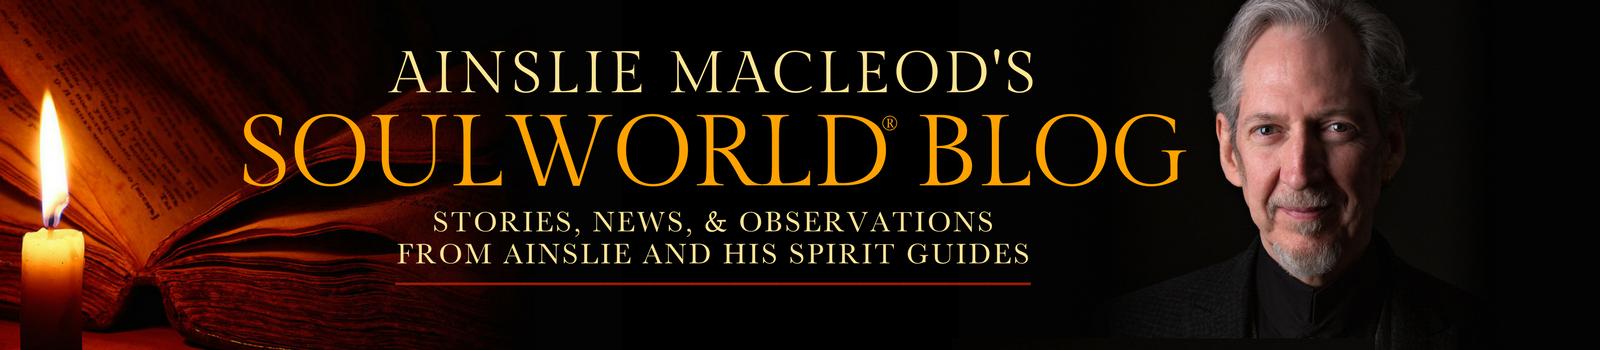 Amazon.com: ainslie macleod: Books